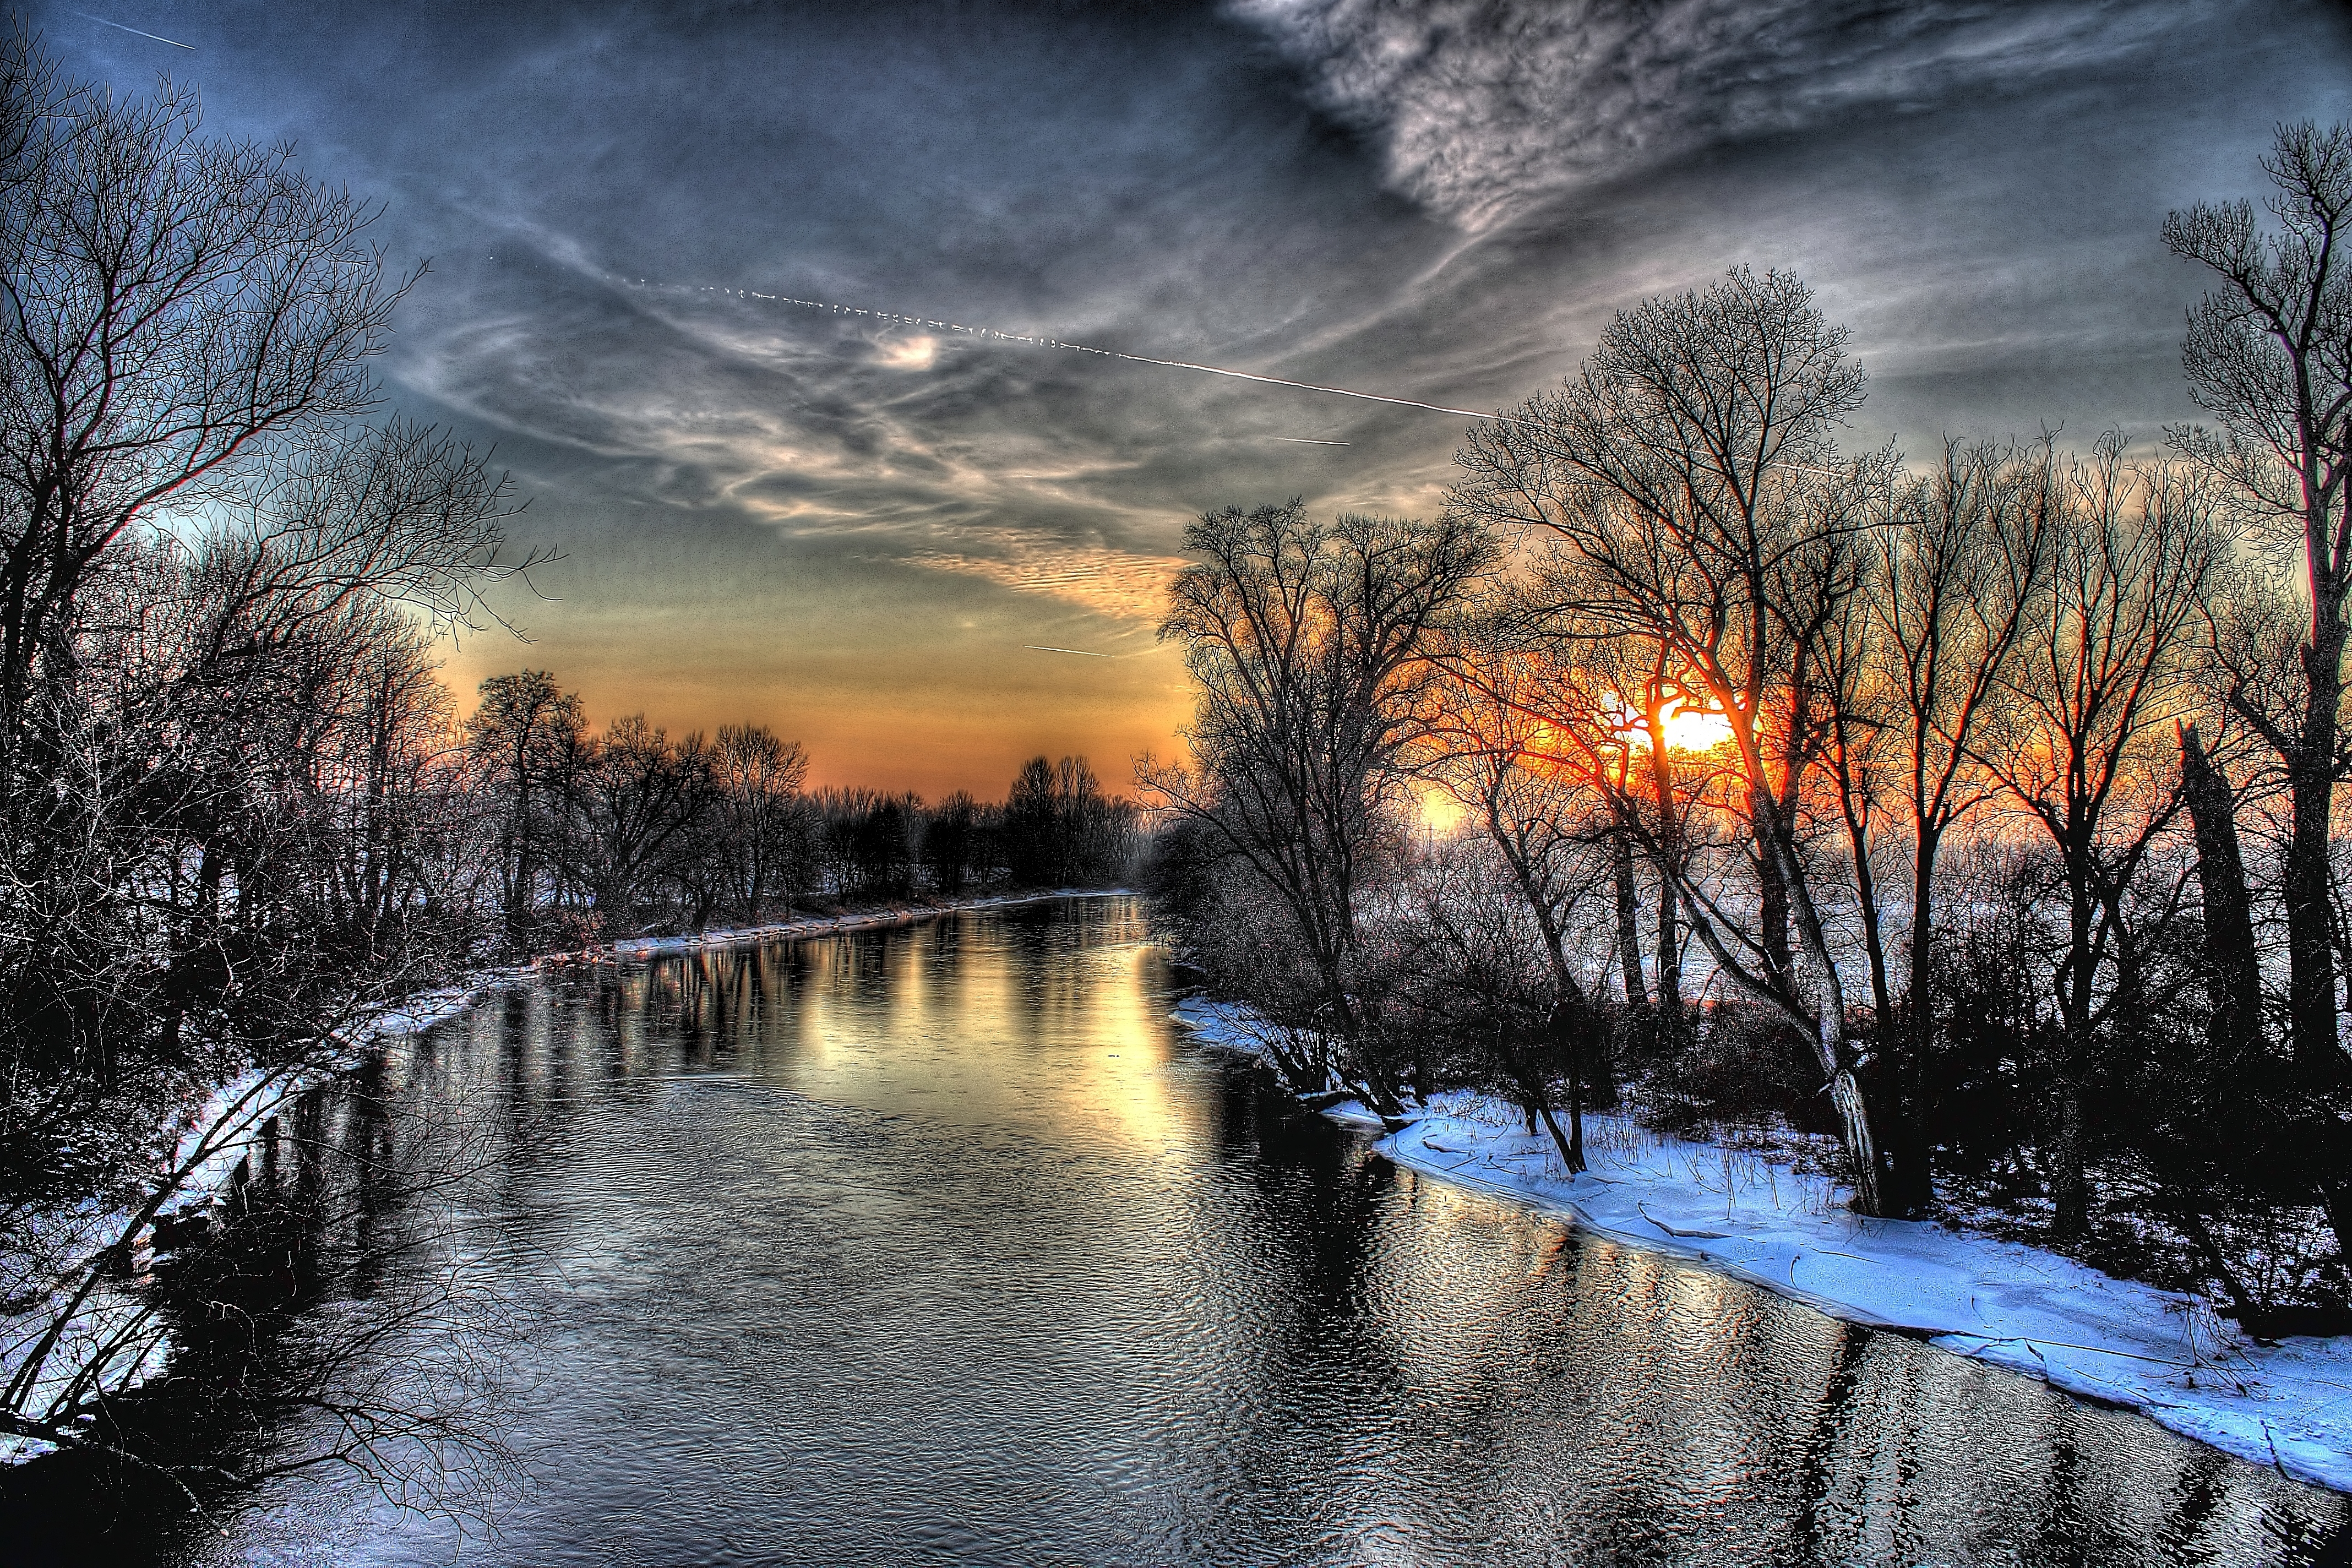 152199 скачать обои Зима, Природа, Закат, Река, Небо, Hdr - заставки и картинки бесплатно